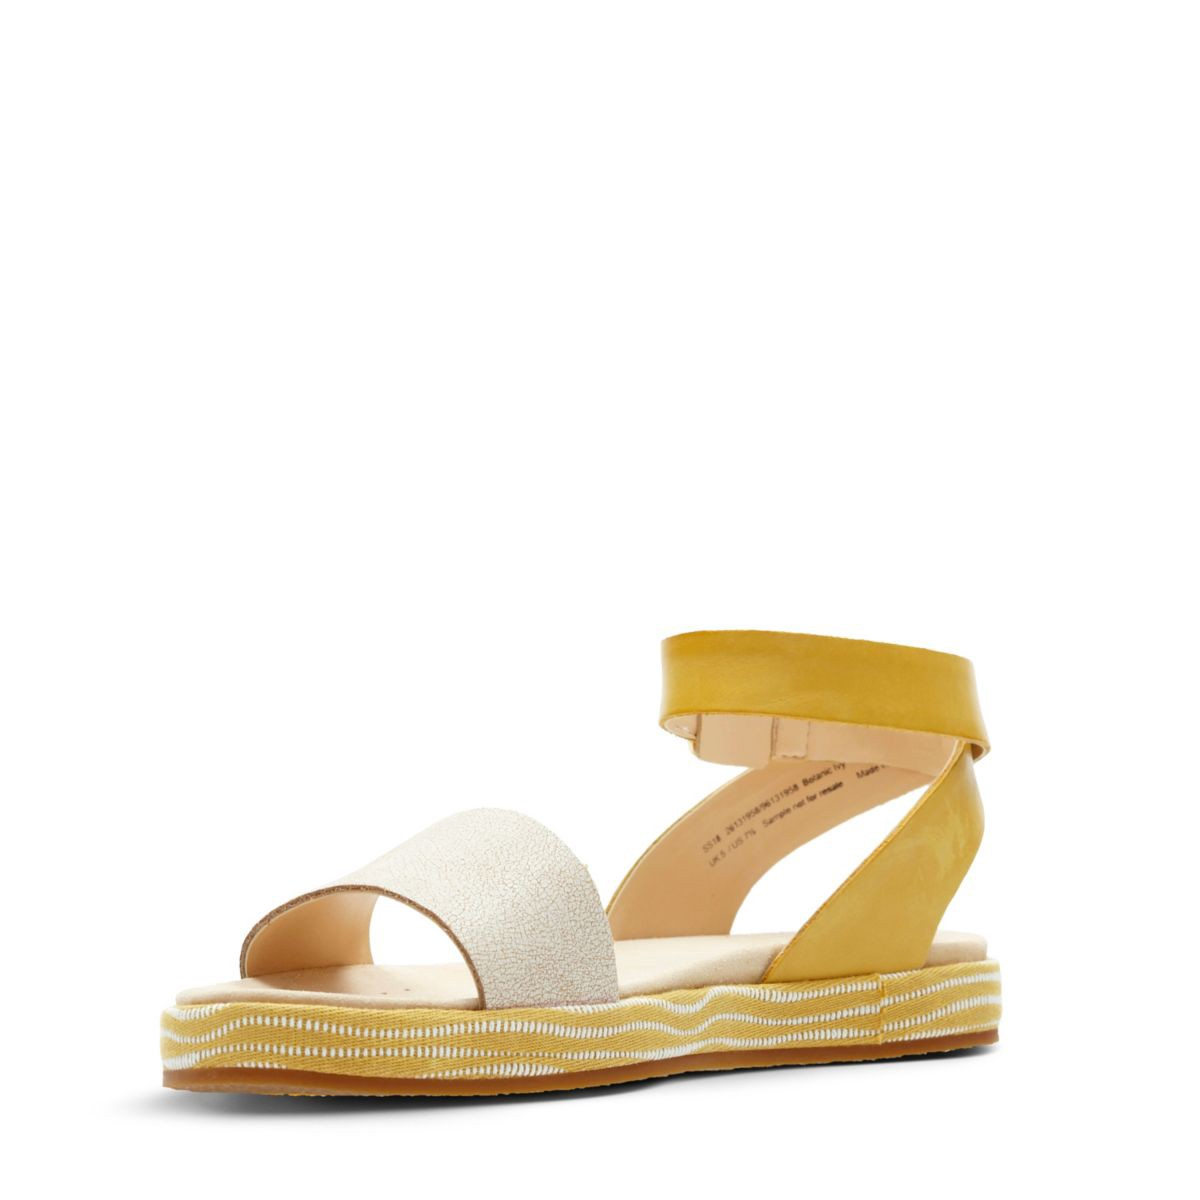 c2b82f49fa8f Clarks Botanic Ivy - Womens Sandals Yellow Combination 7